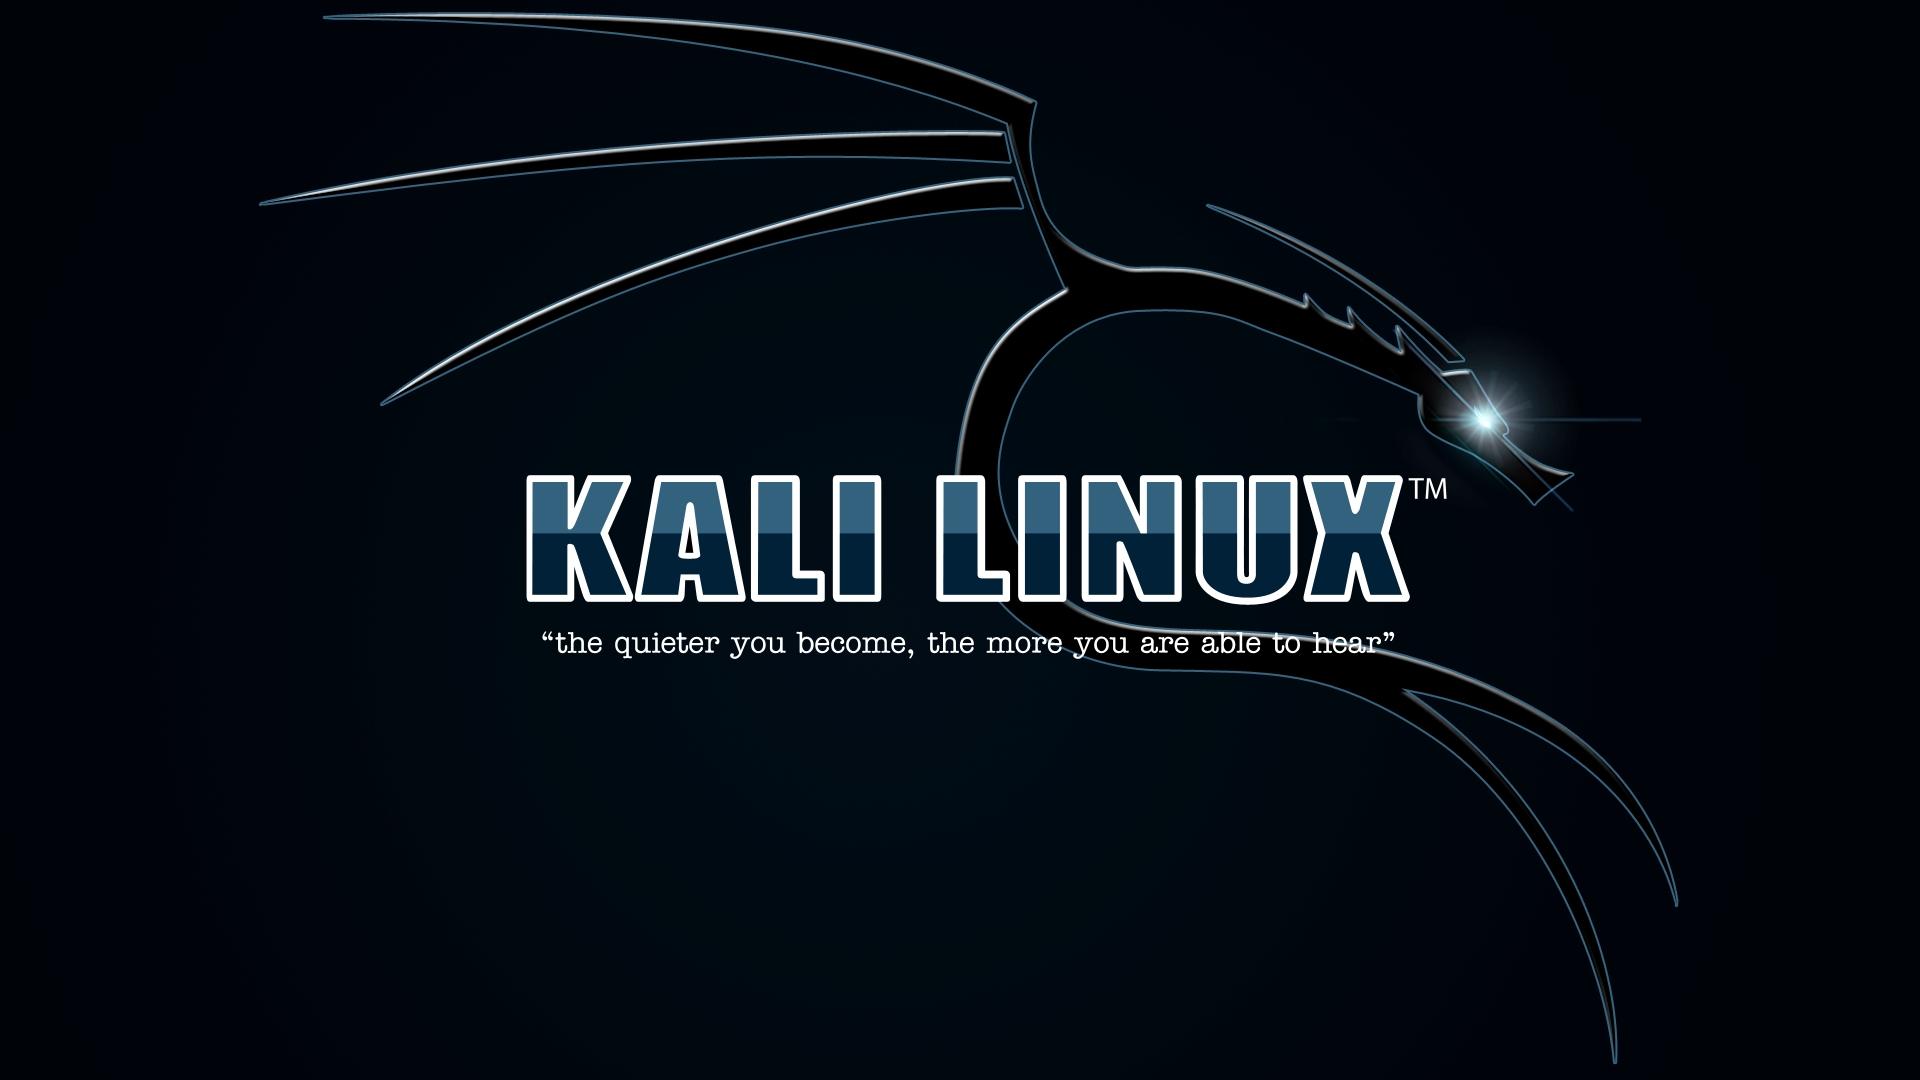 kali linux wallpapers | kali linux